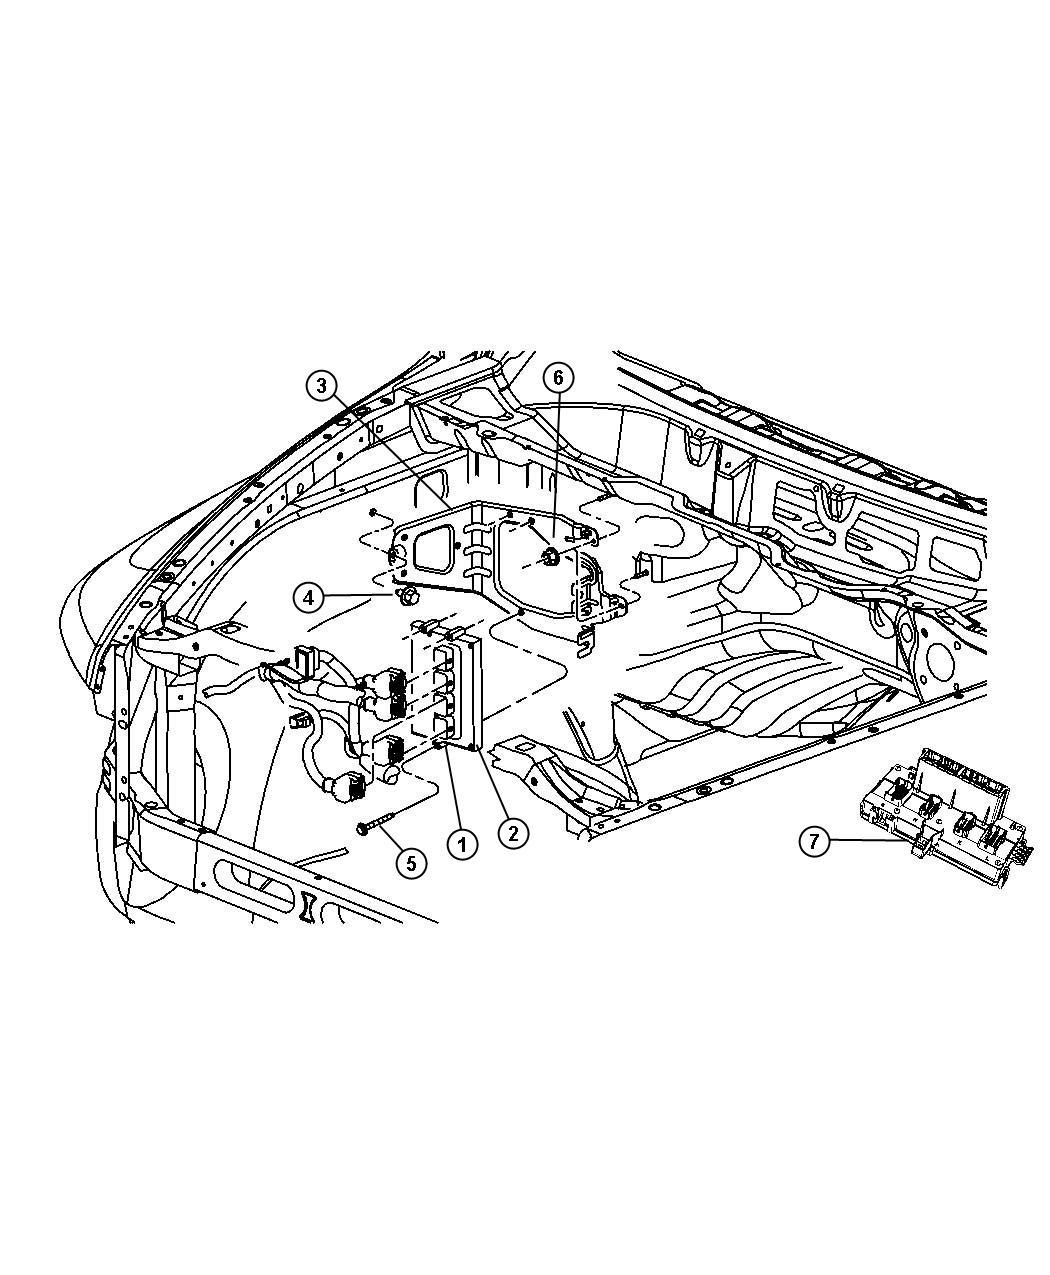 jeep wrangler module powertrain control generic. Black Bedroom Furniture Sets. Home Design Ideas